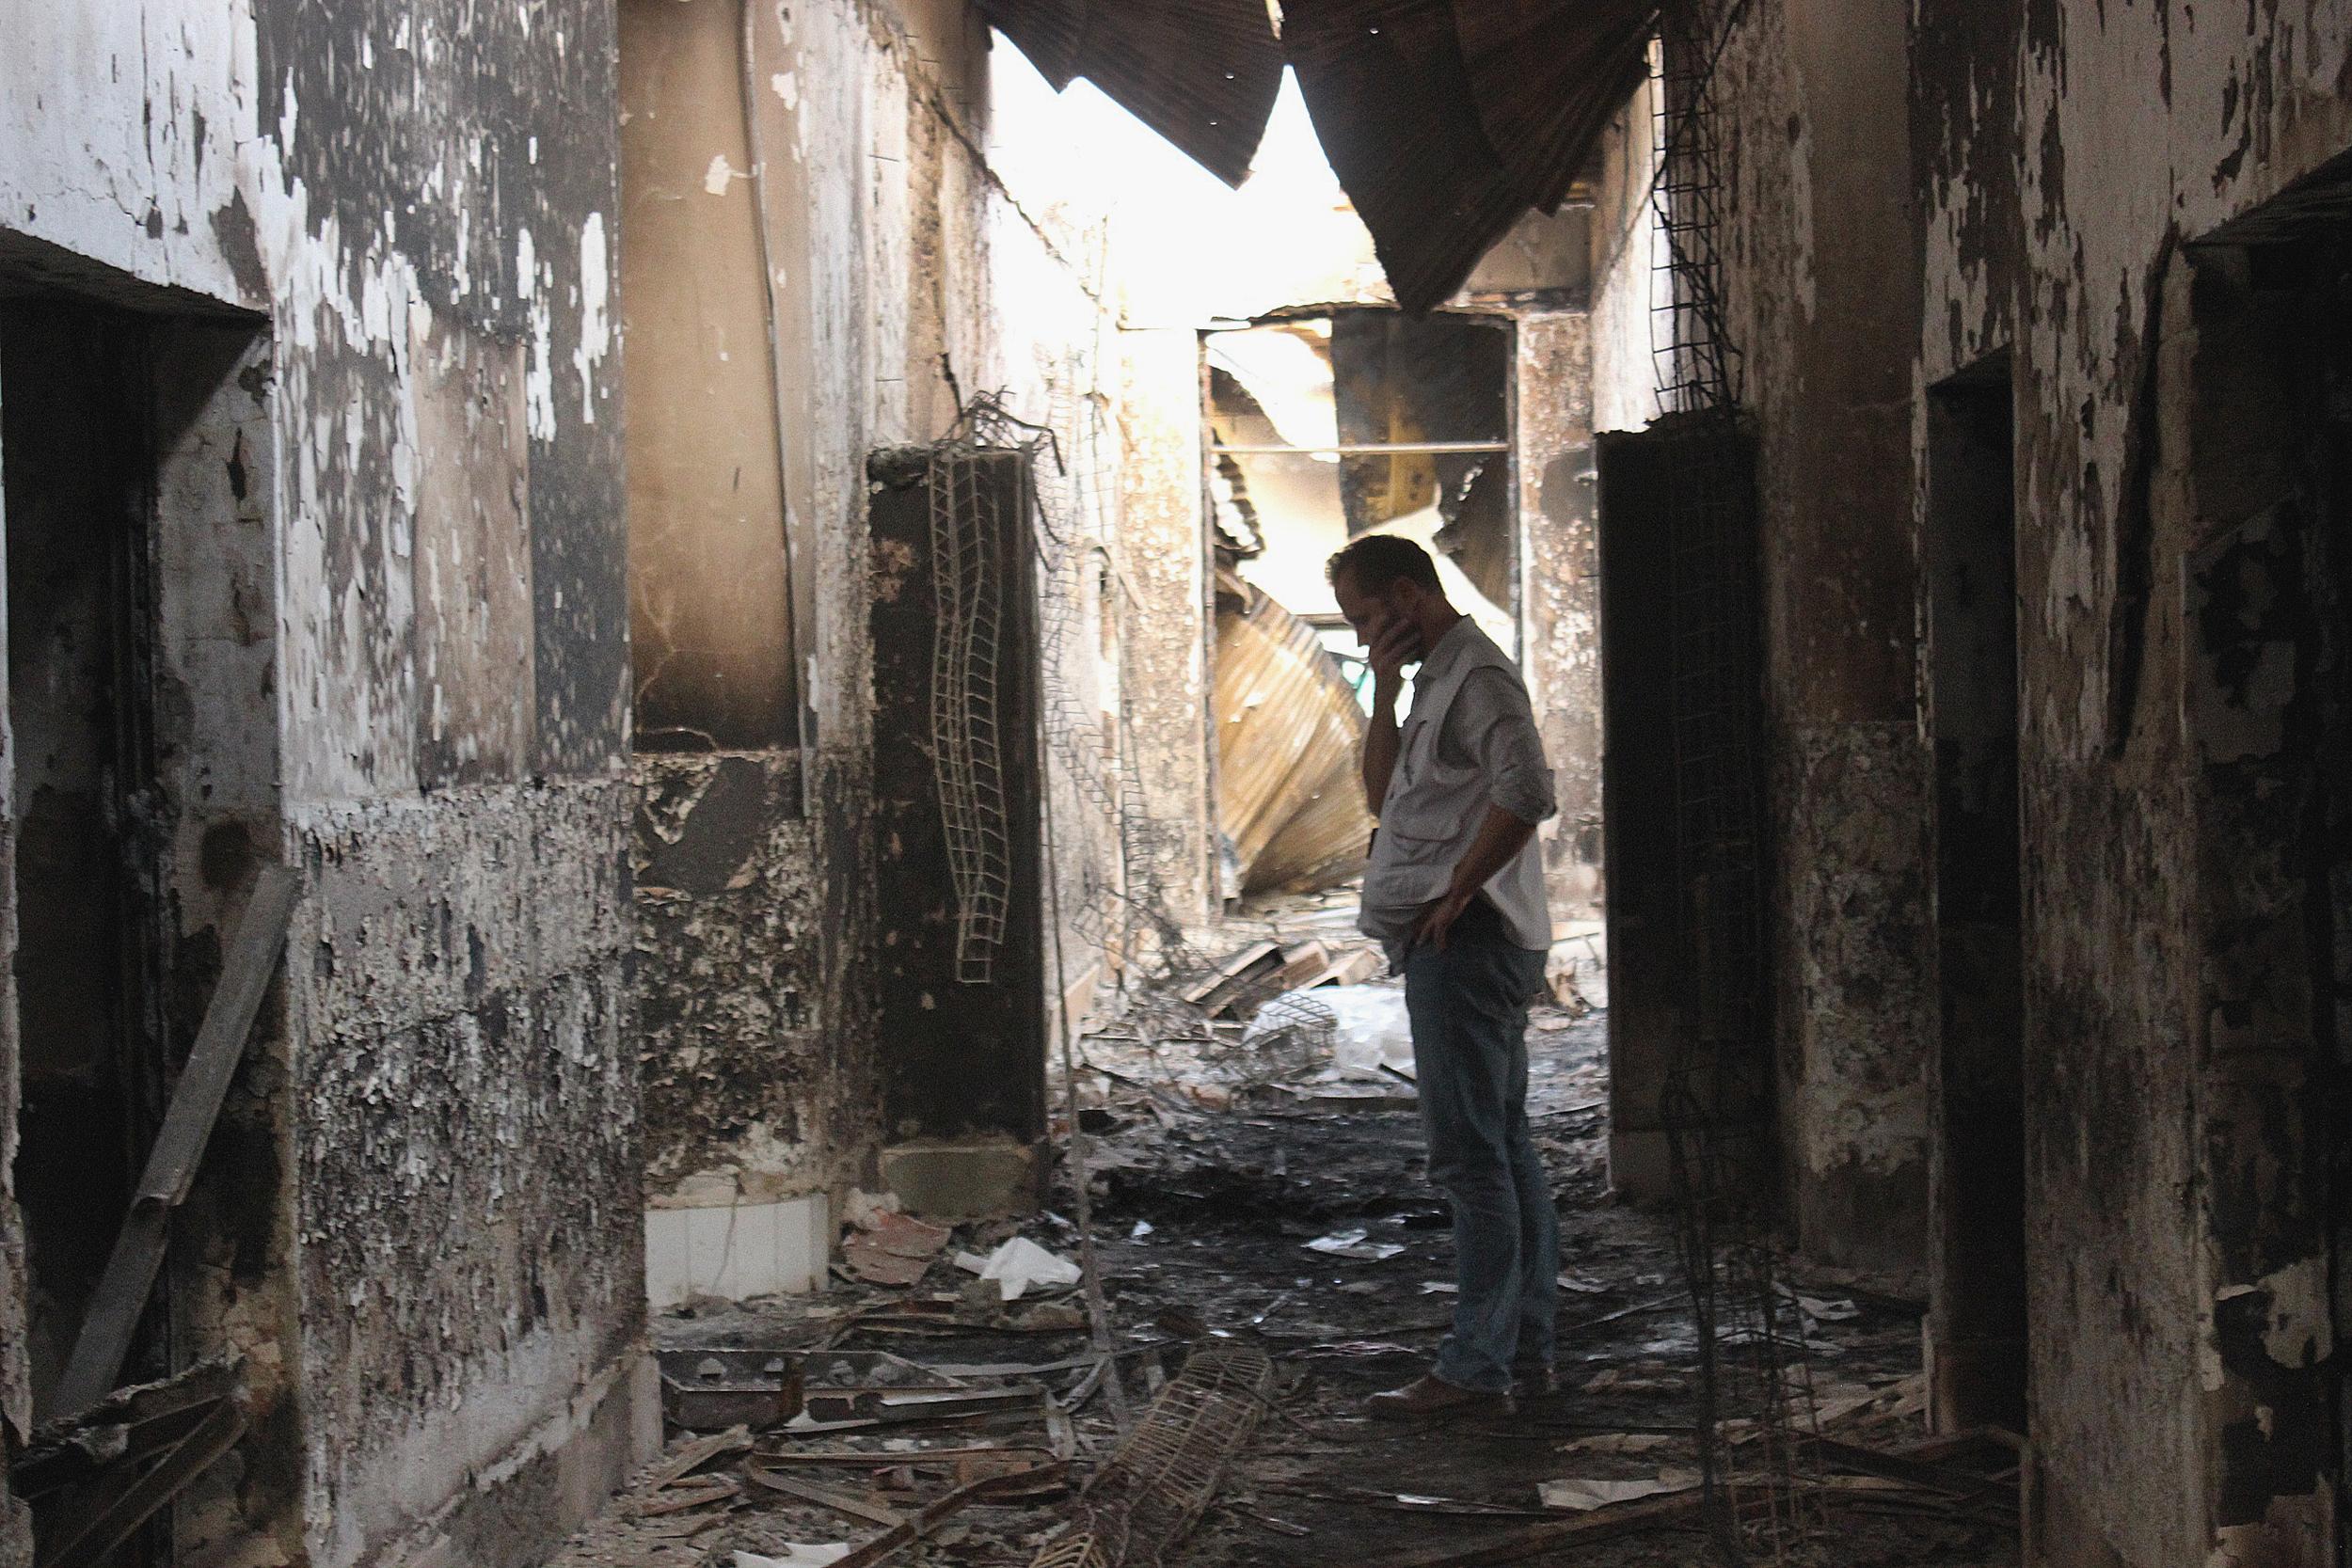 Pentagon Punishes 16 for Afghan Hospital Airstrike